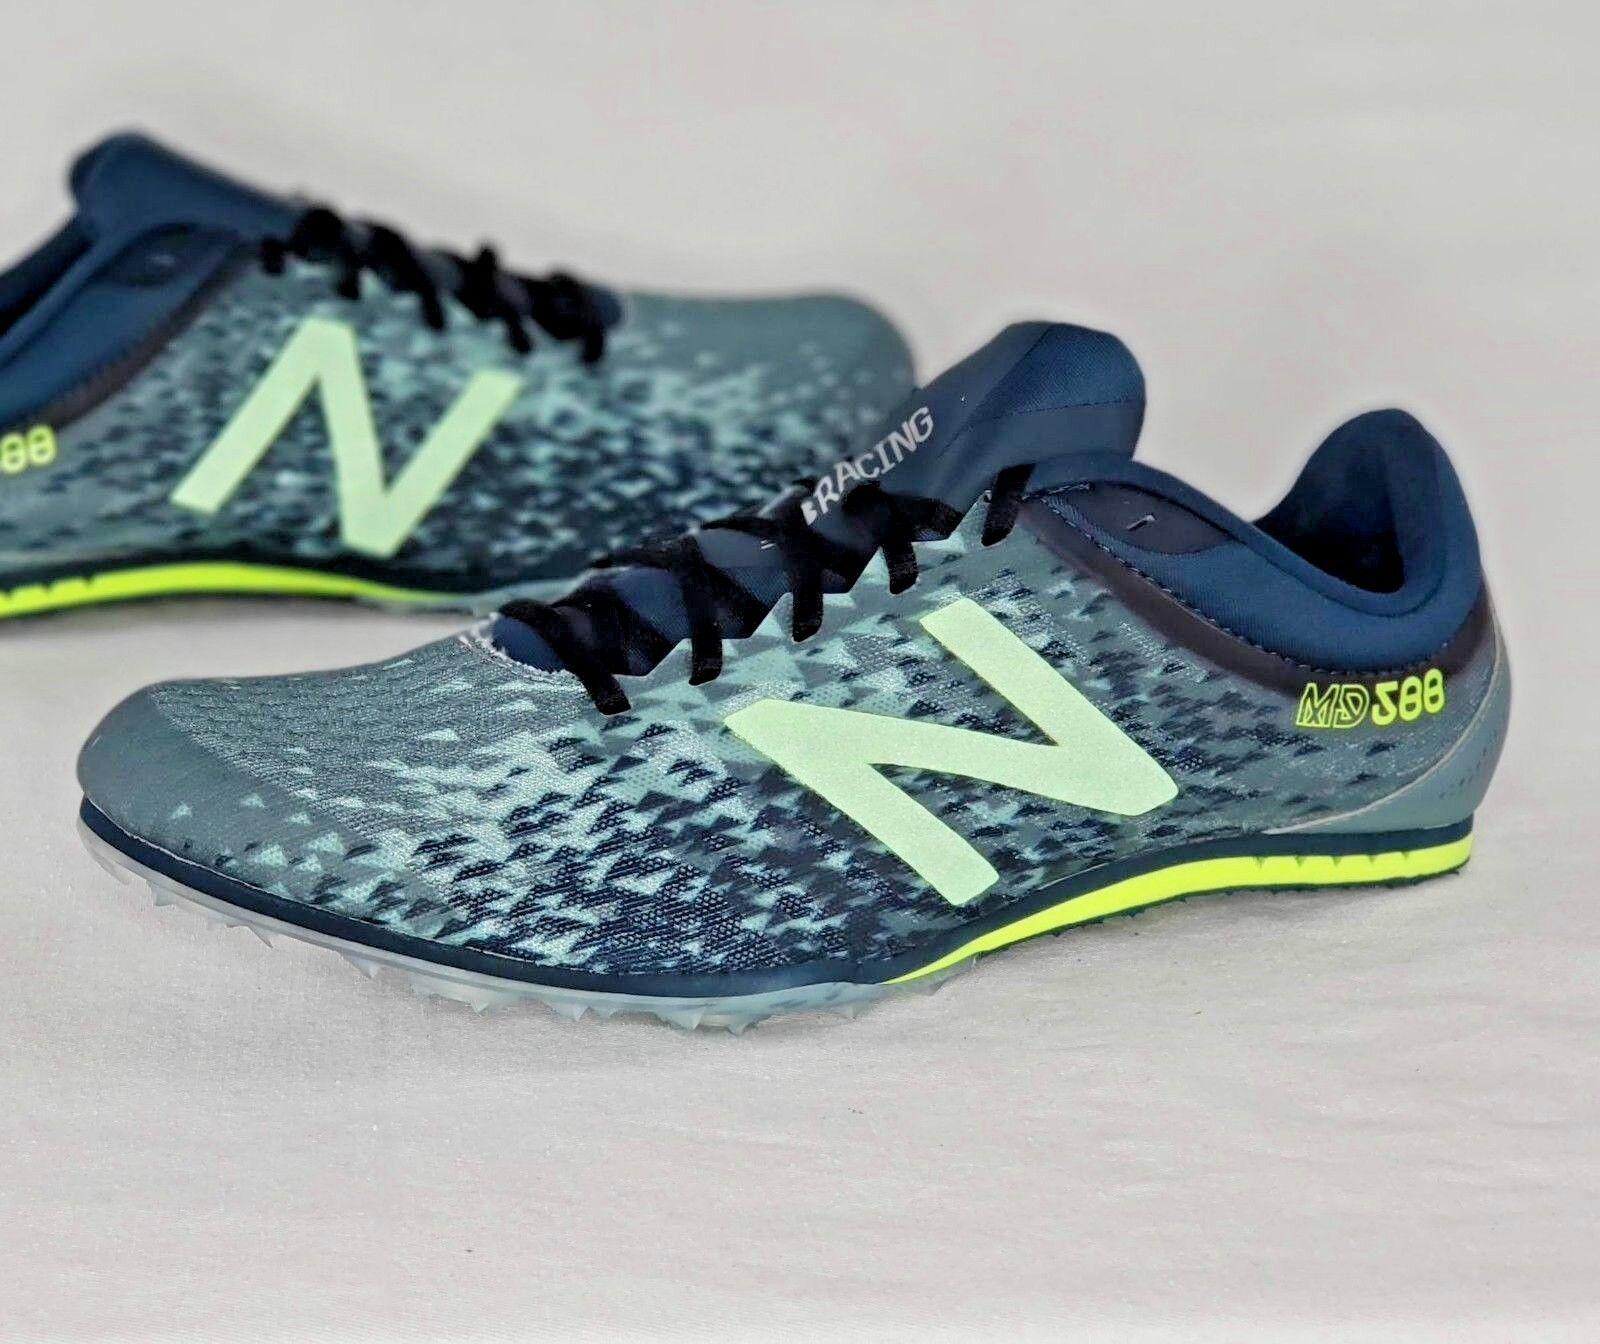 New Balance Track & Field Spike Spike Spike Running shoes Sz 10.5   44.5 MMD500G5 MD500 720cbf